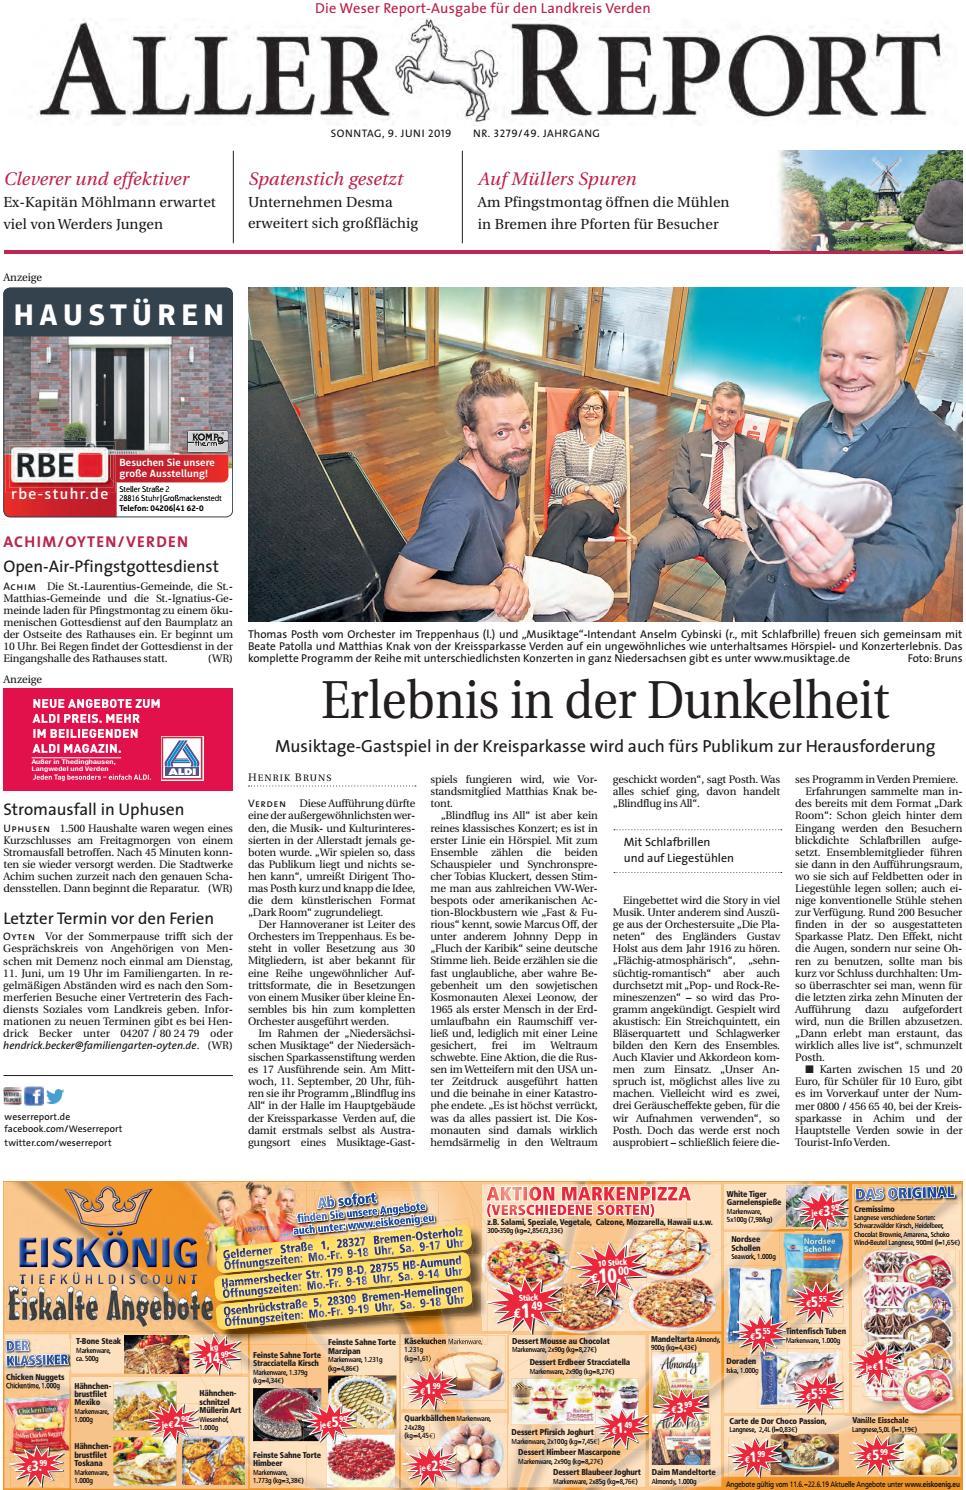 Aller Report vom 09.06.2019 by KPS Verlagsgesellschaft mbH - issuu